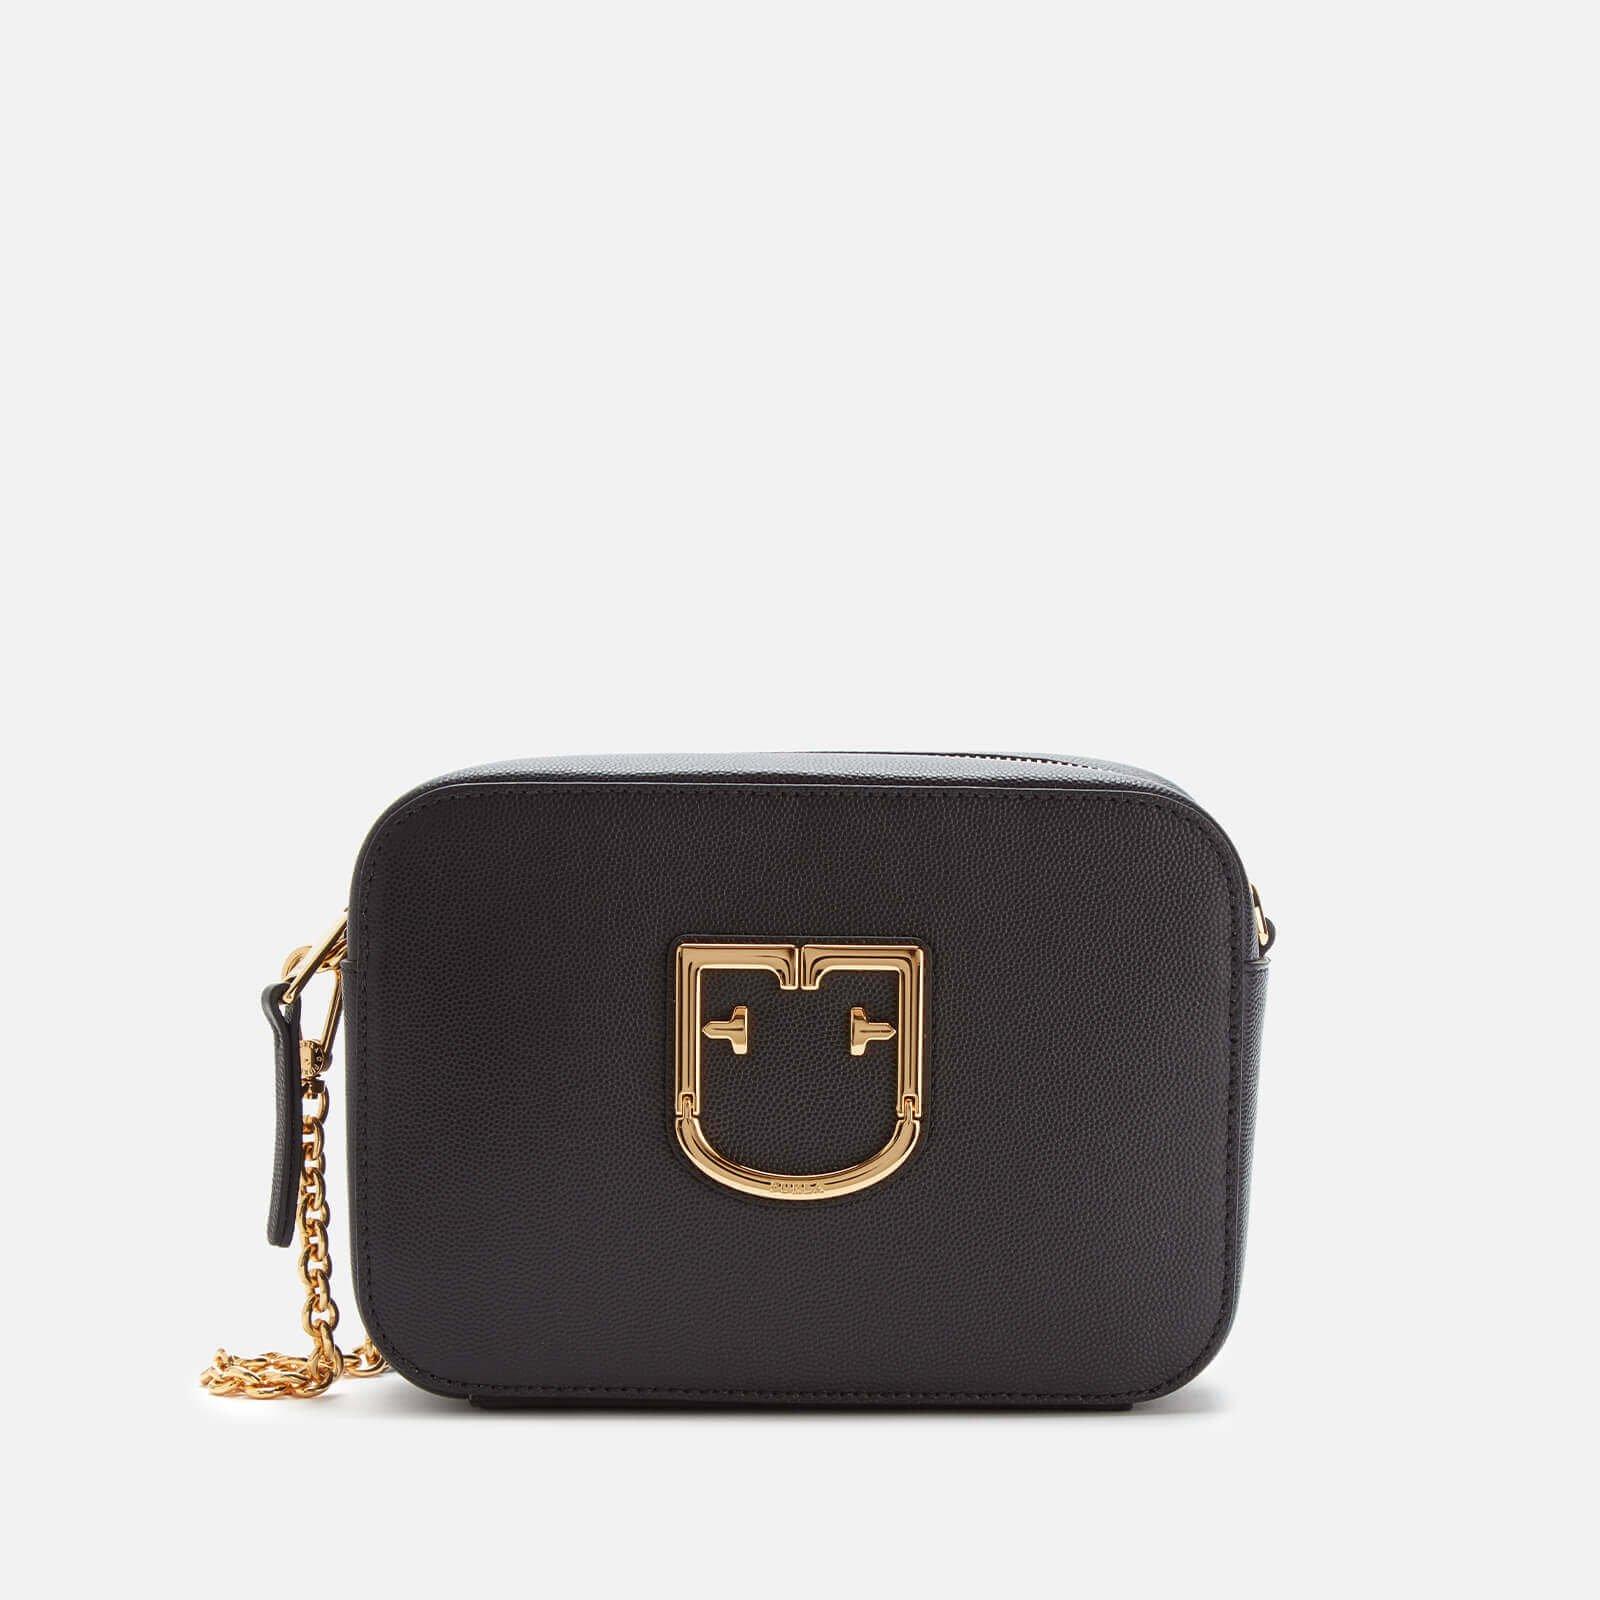 Furla Women's Brava Mini Cross Body Bag